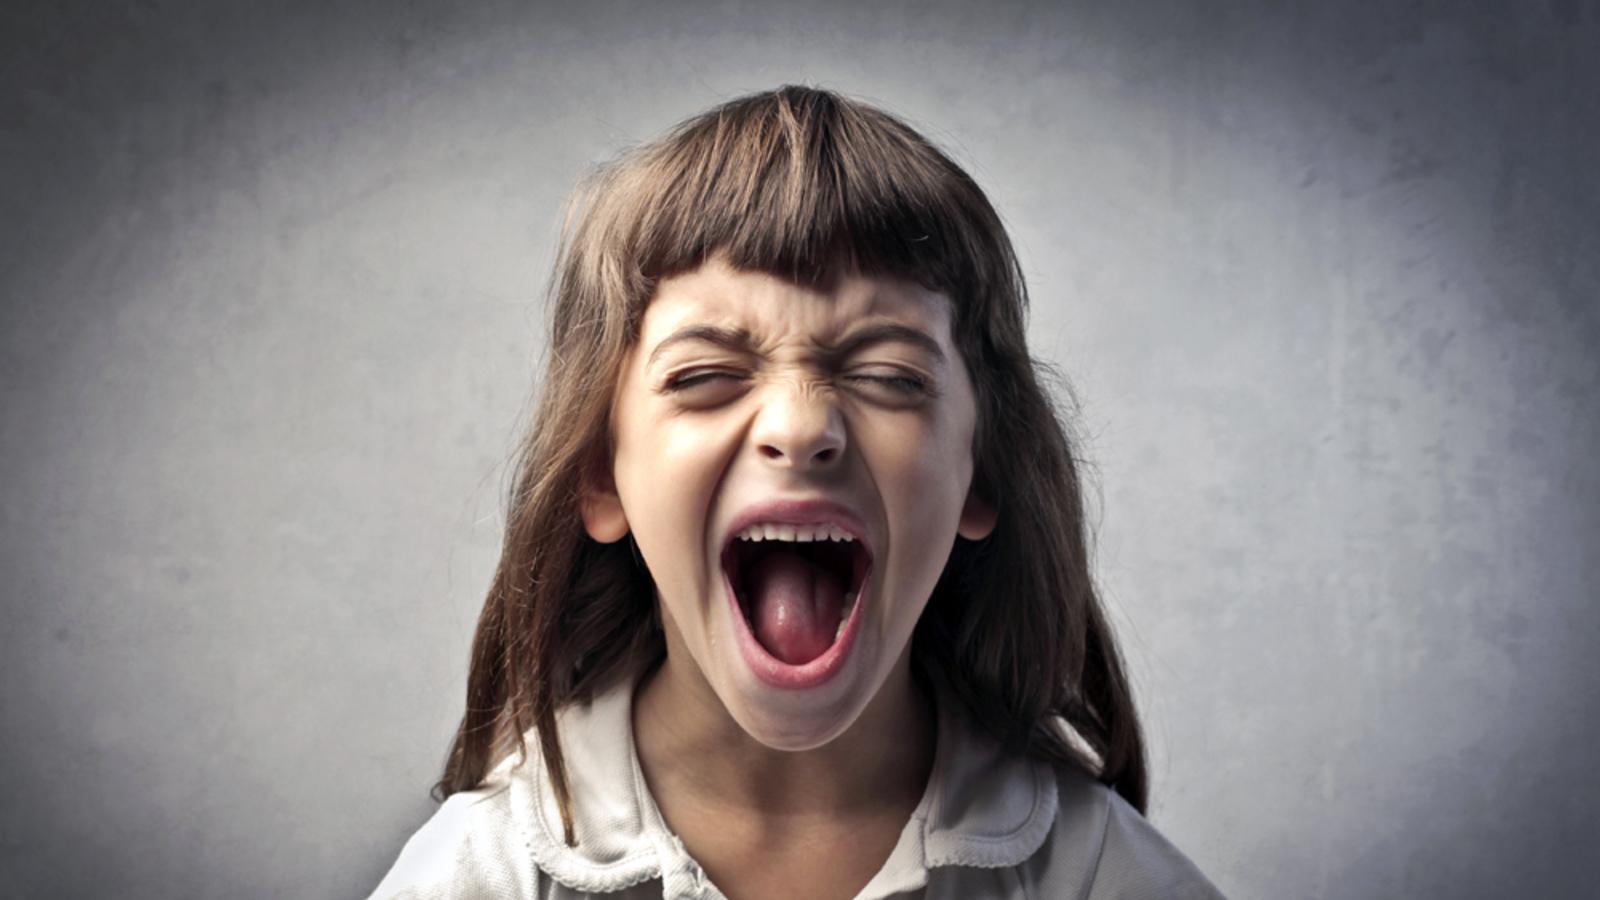 kinderen-verheffen-hun-stem